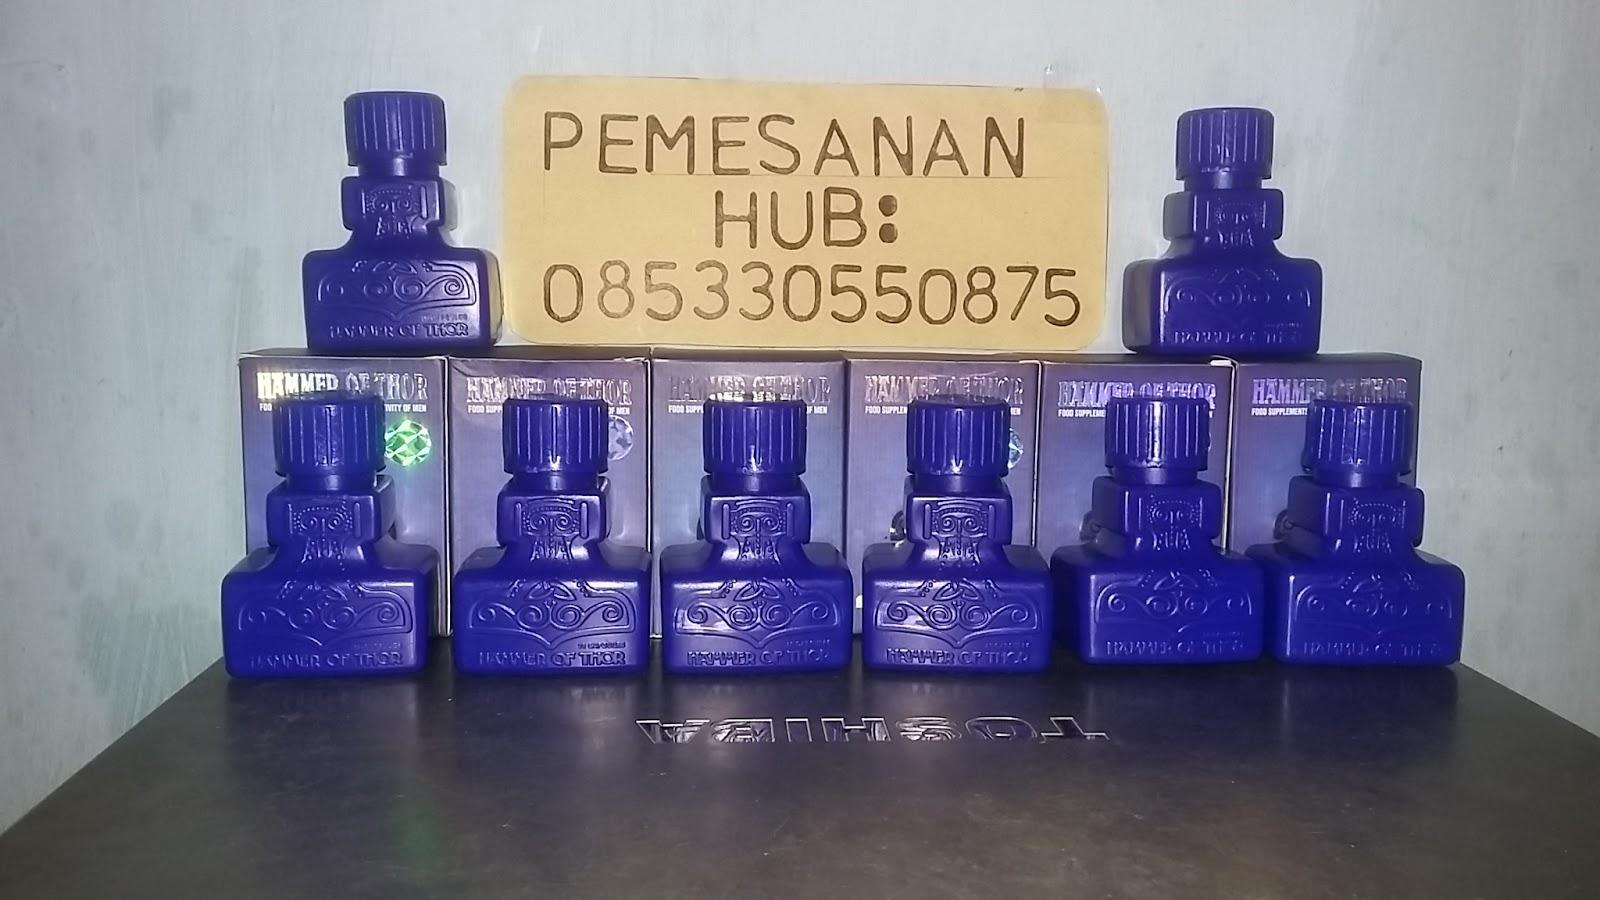 jual apotek hammer of thor samarinda agenhammerofthor site www